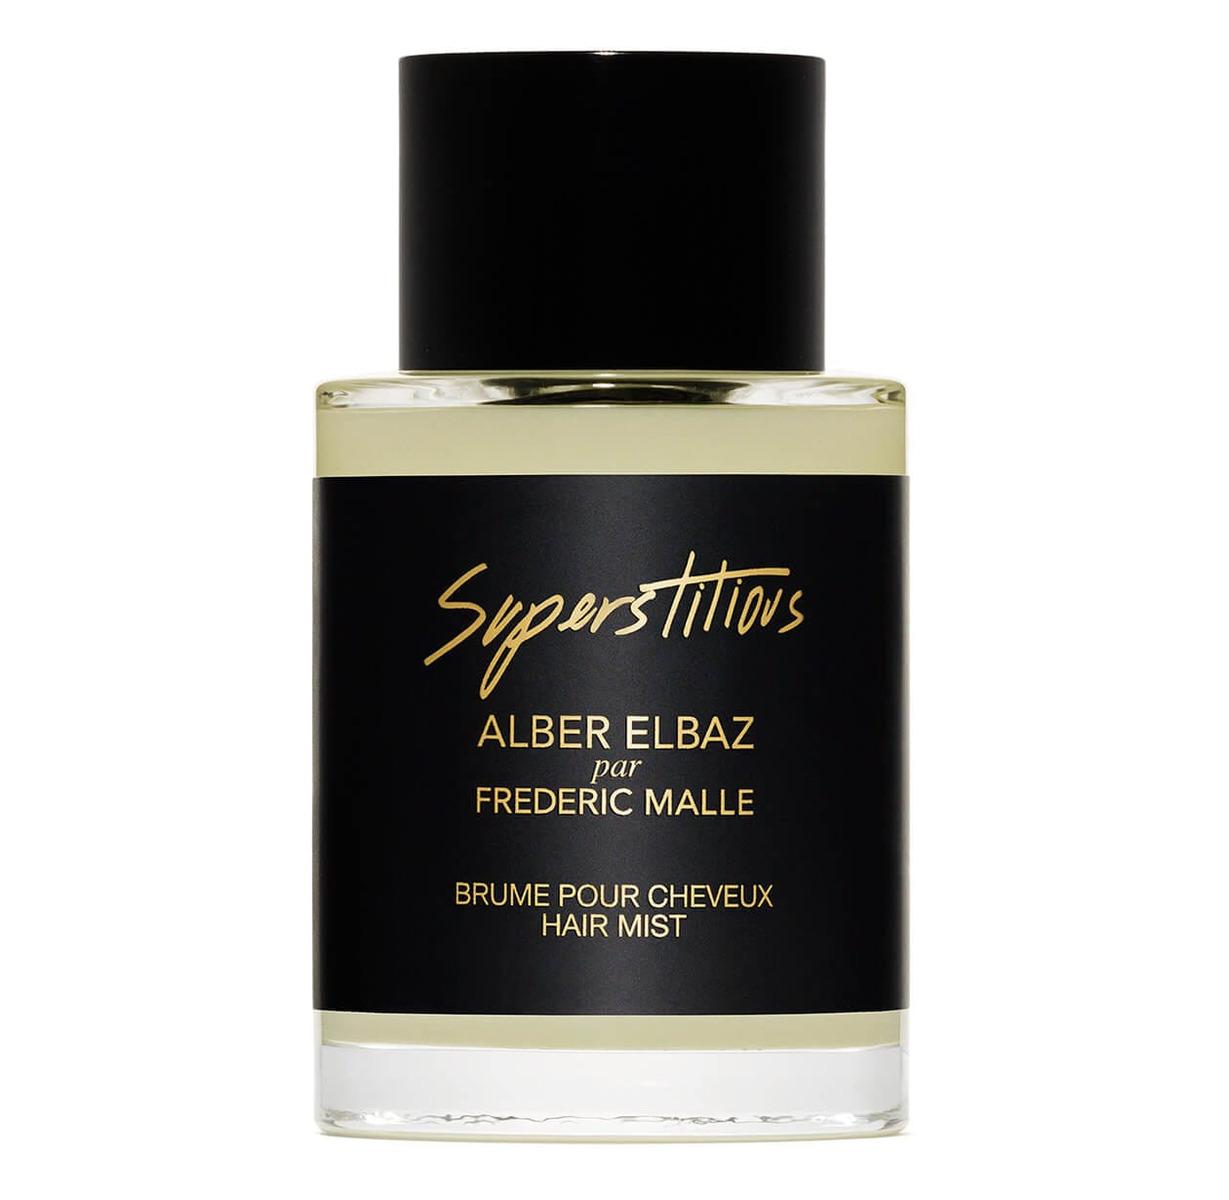 FREDERIC MALLE フレデリック マル スーパースティシャス Superstitious Hair Mist 100ml